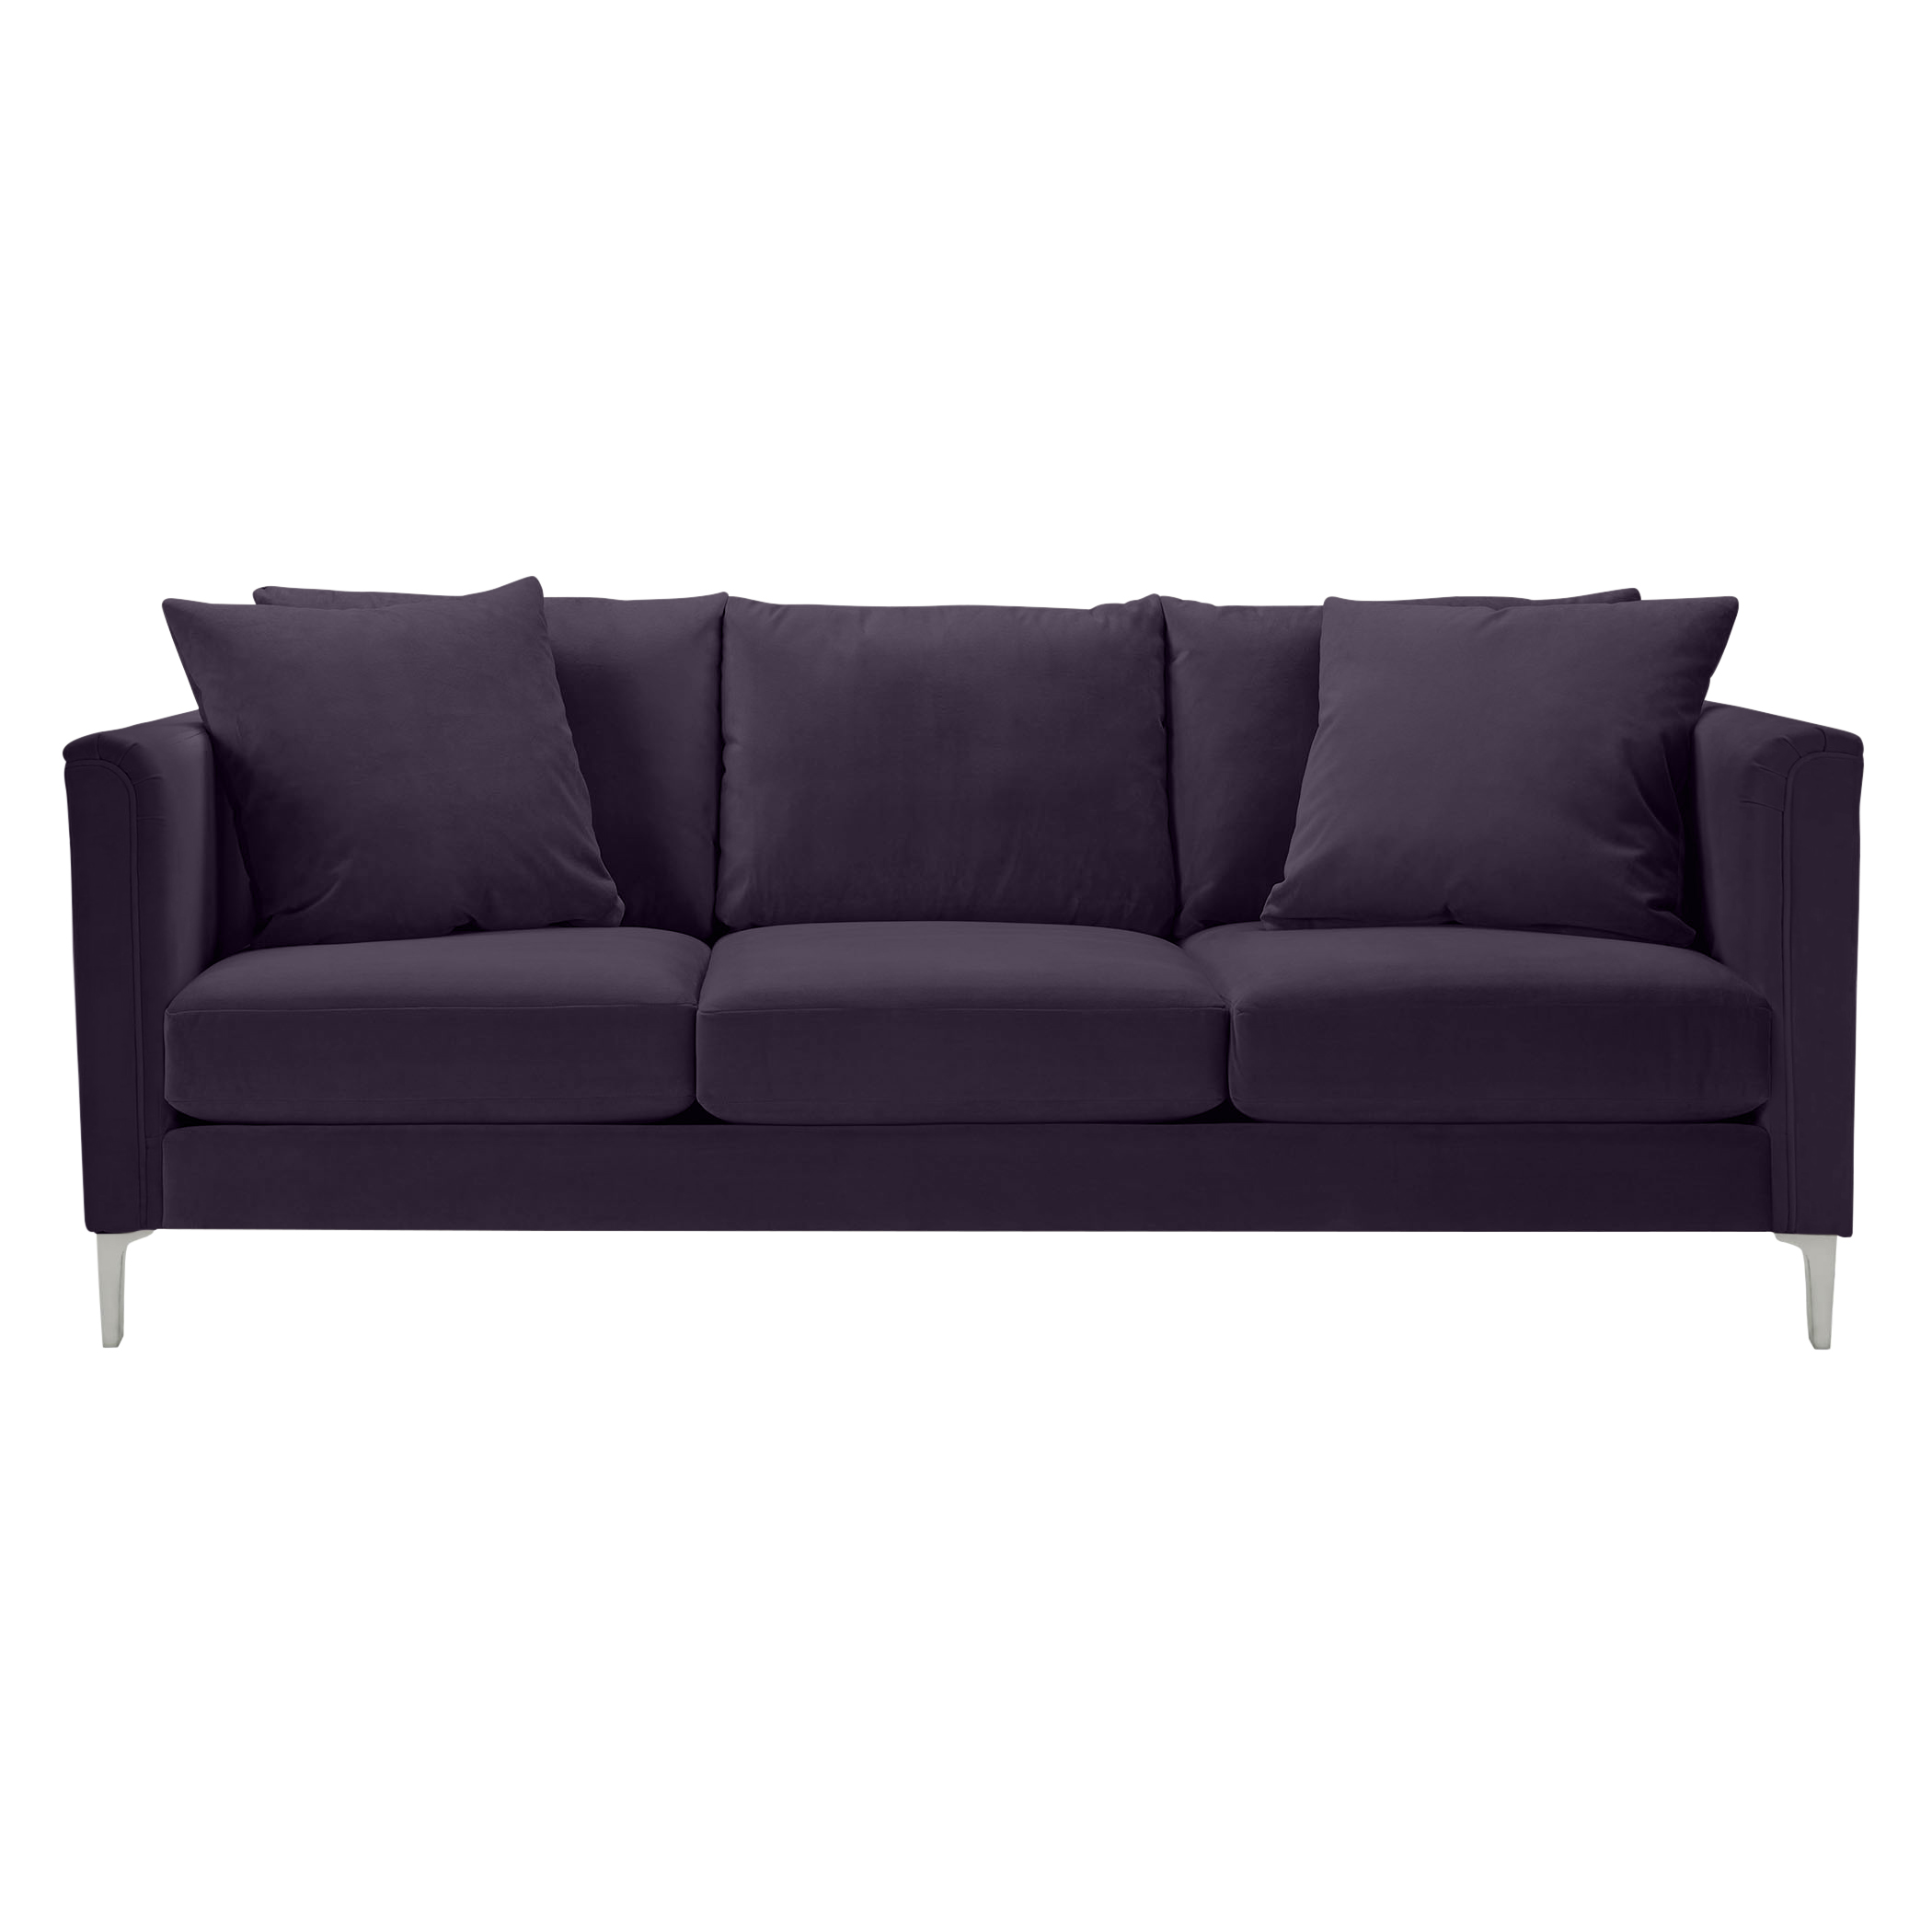 Details Soft Roll Arm Sofa